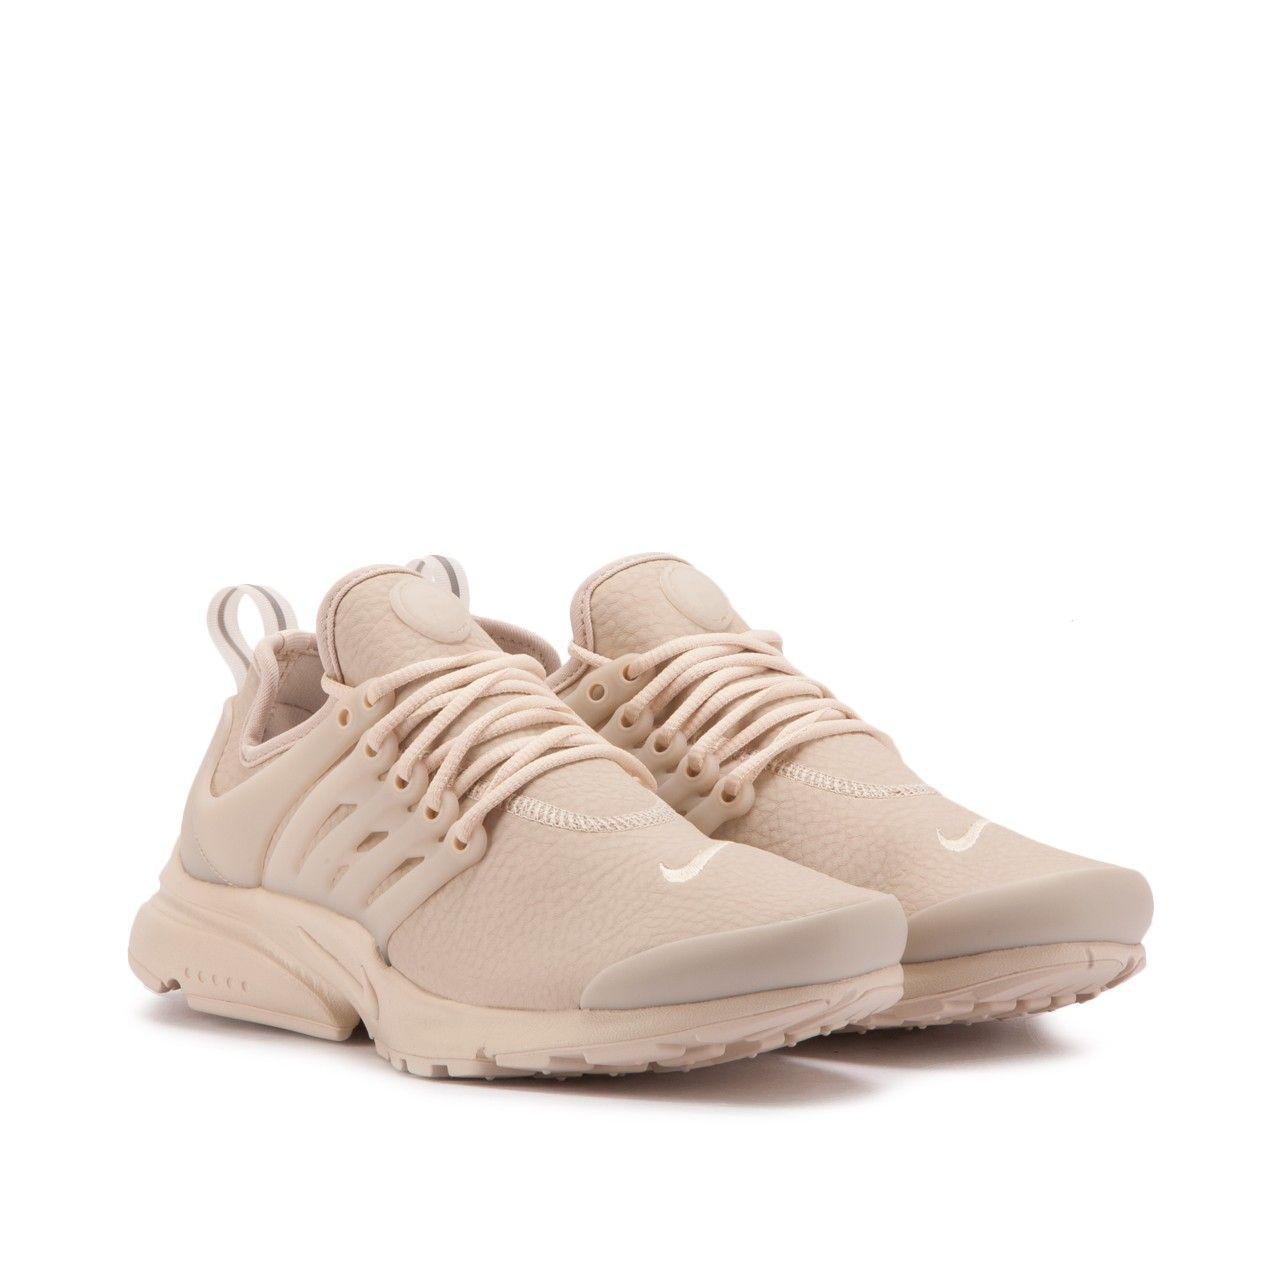 nike presto beige   Foot Wear   Pinterest   Nike, Nike presto and Shoes 3da98d191b38